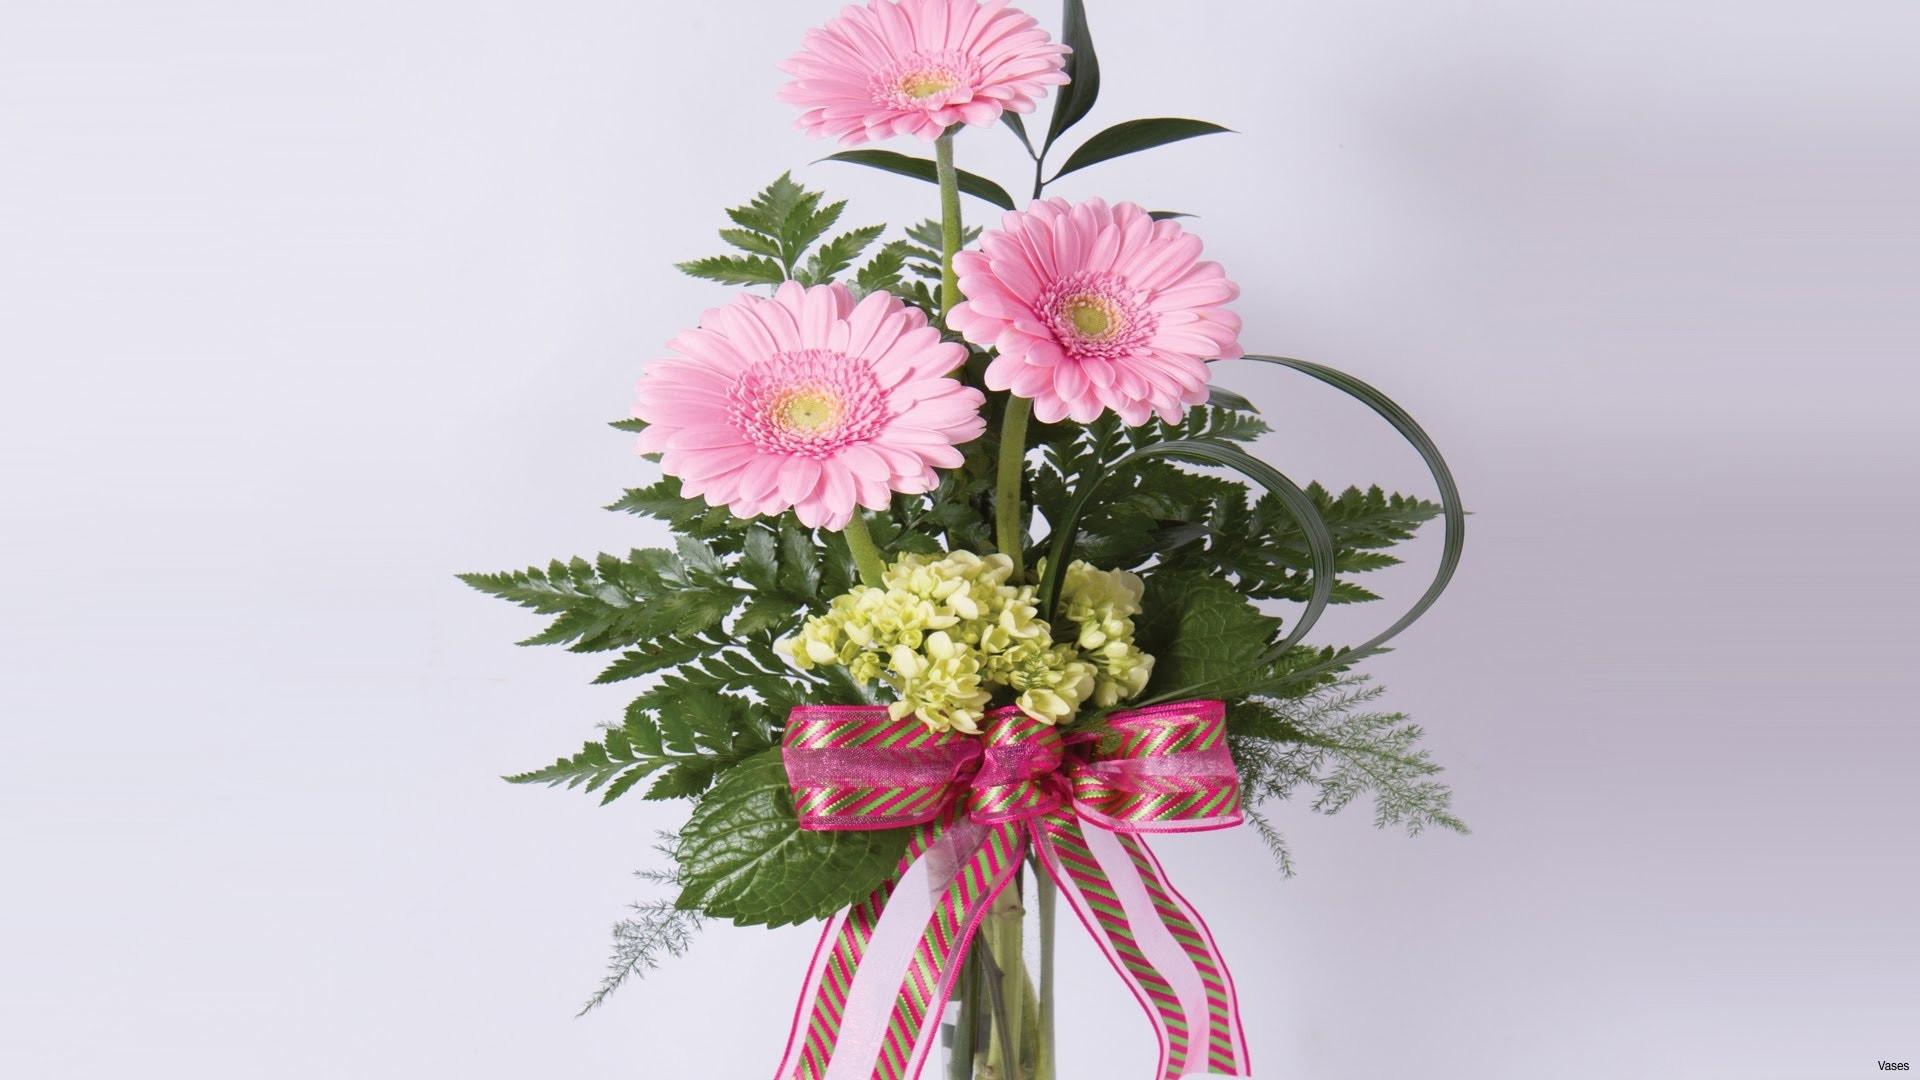 Cemetery Vases Metal Of 27 Beautiful Flower Vase Definition Flower Decoration Ideas Regarding Flower Vase Definition Best Of 36 Beautiful Picture Arrangements